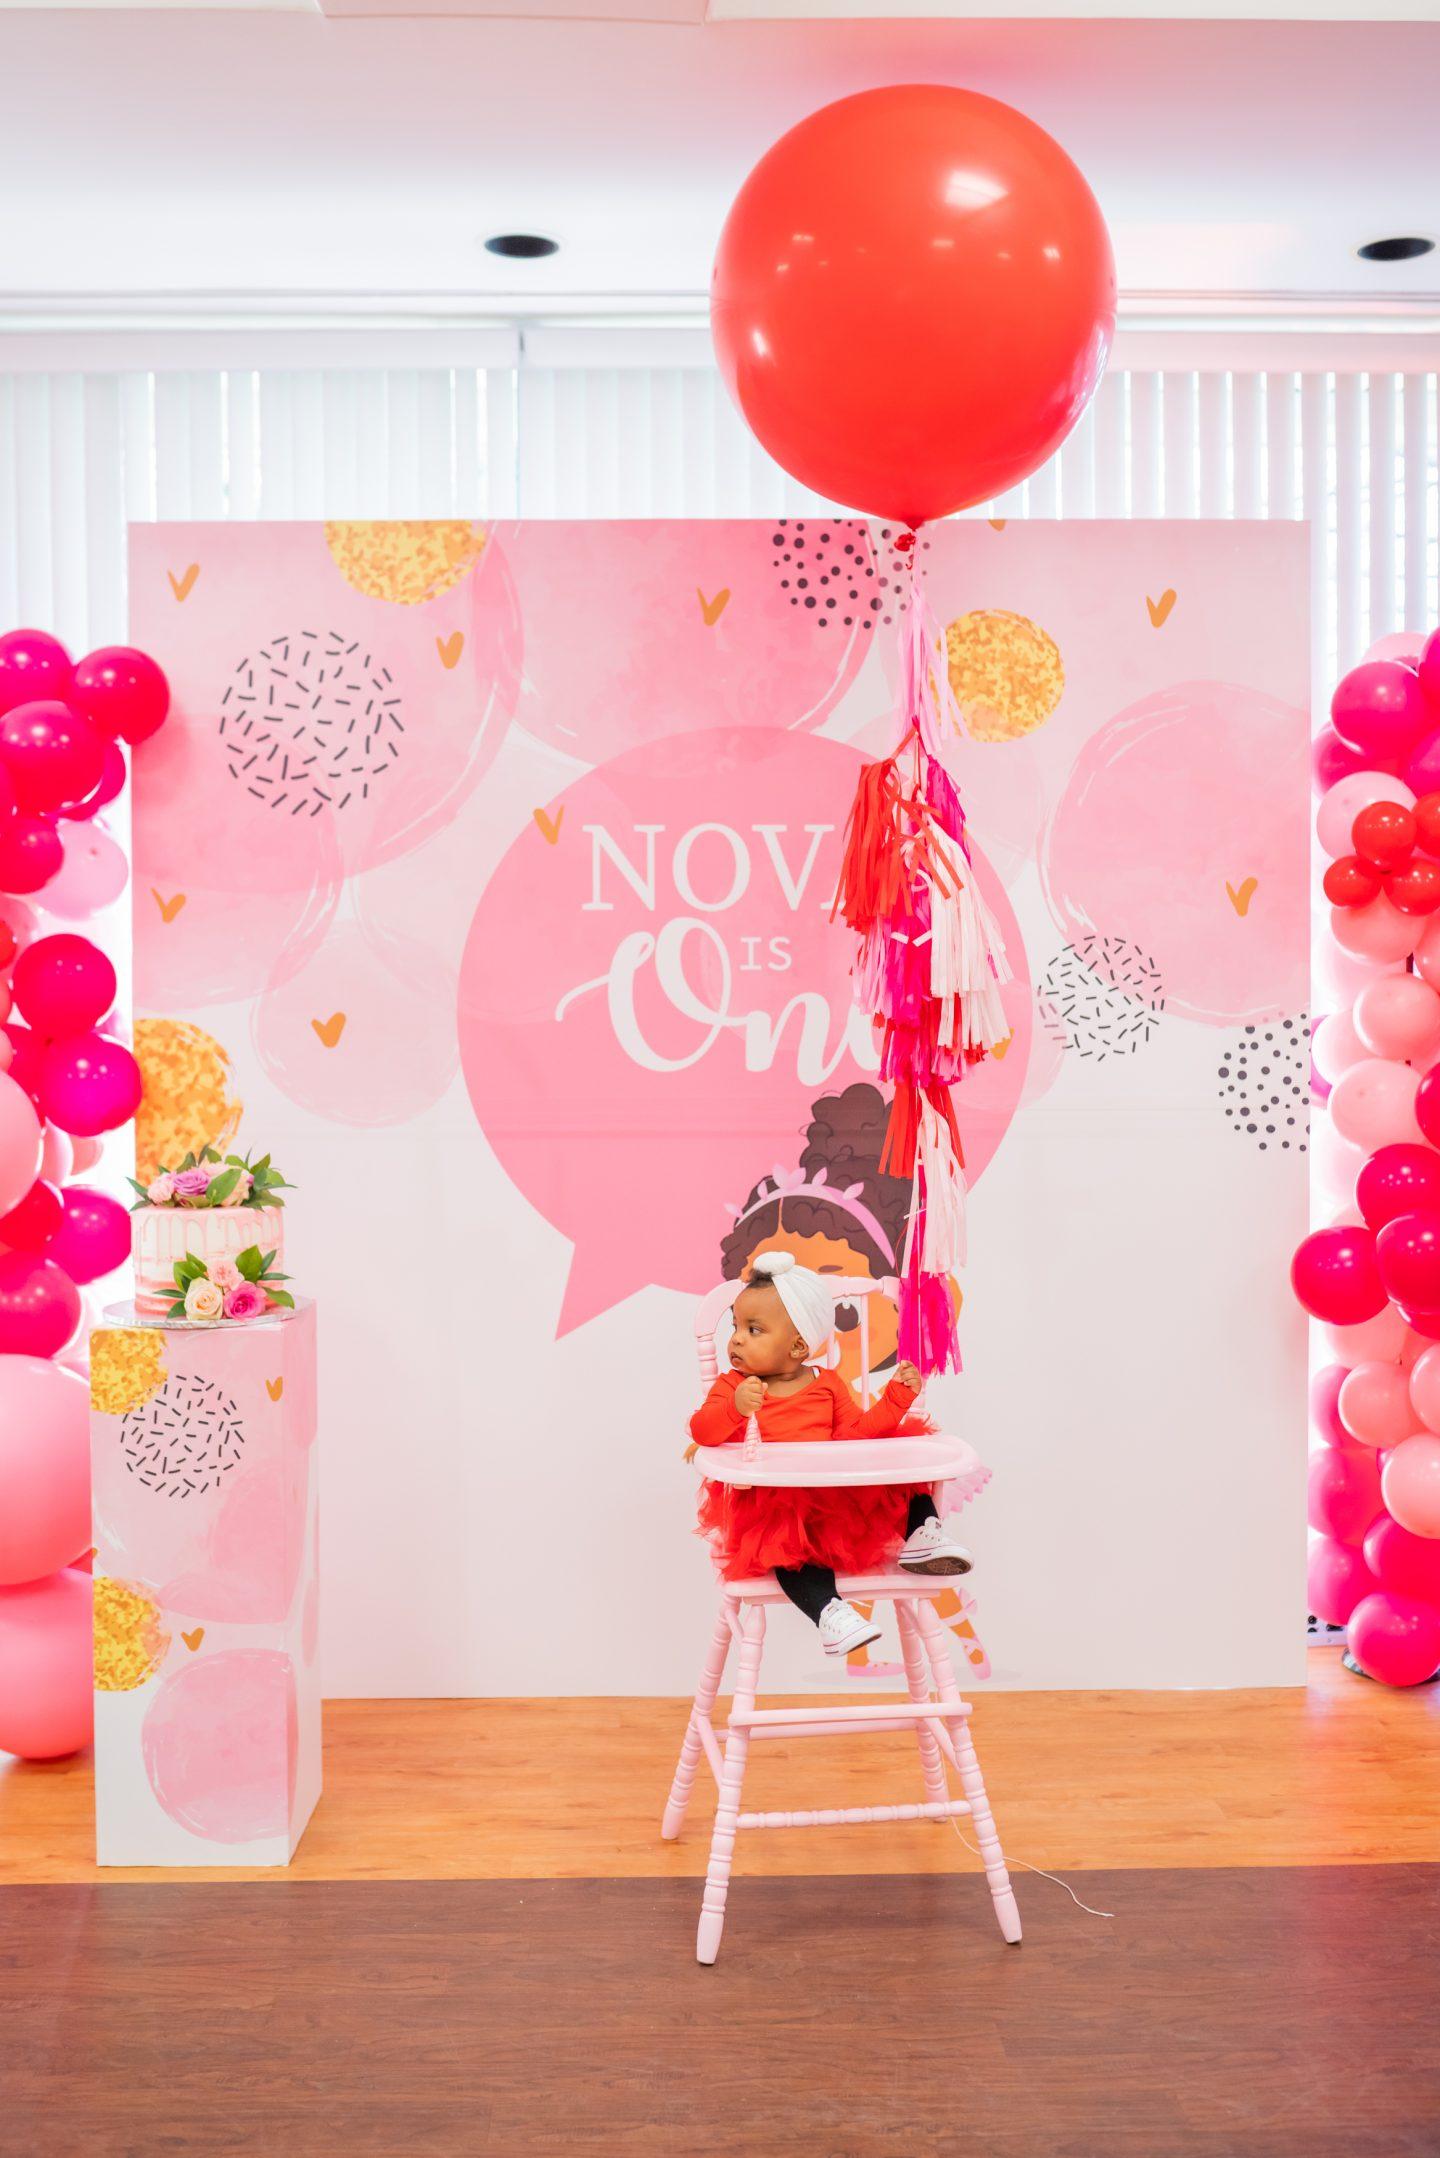 stella-adewunmi-of-jadore-fashion-blog-shares-nova-kids-valentines-day-birthday-ideas